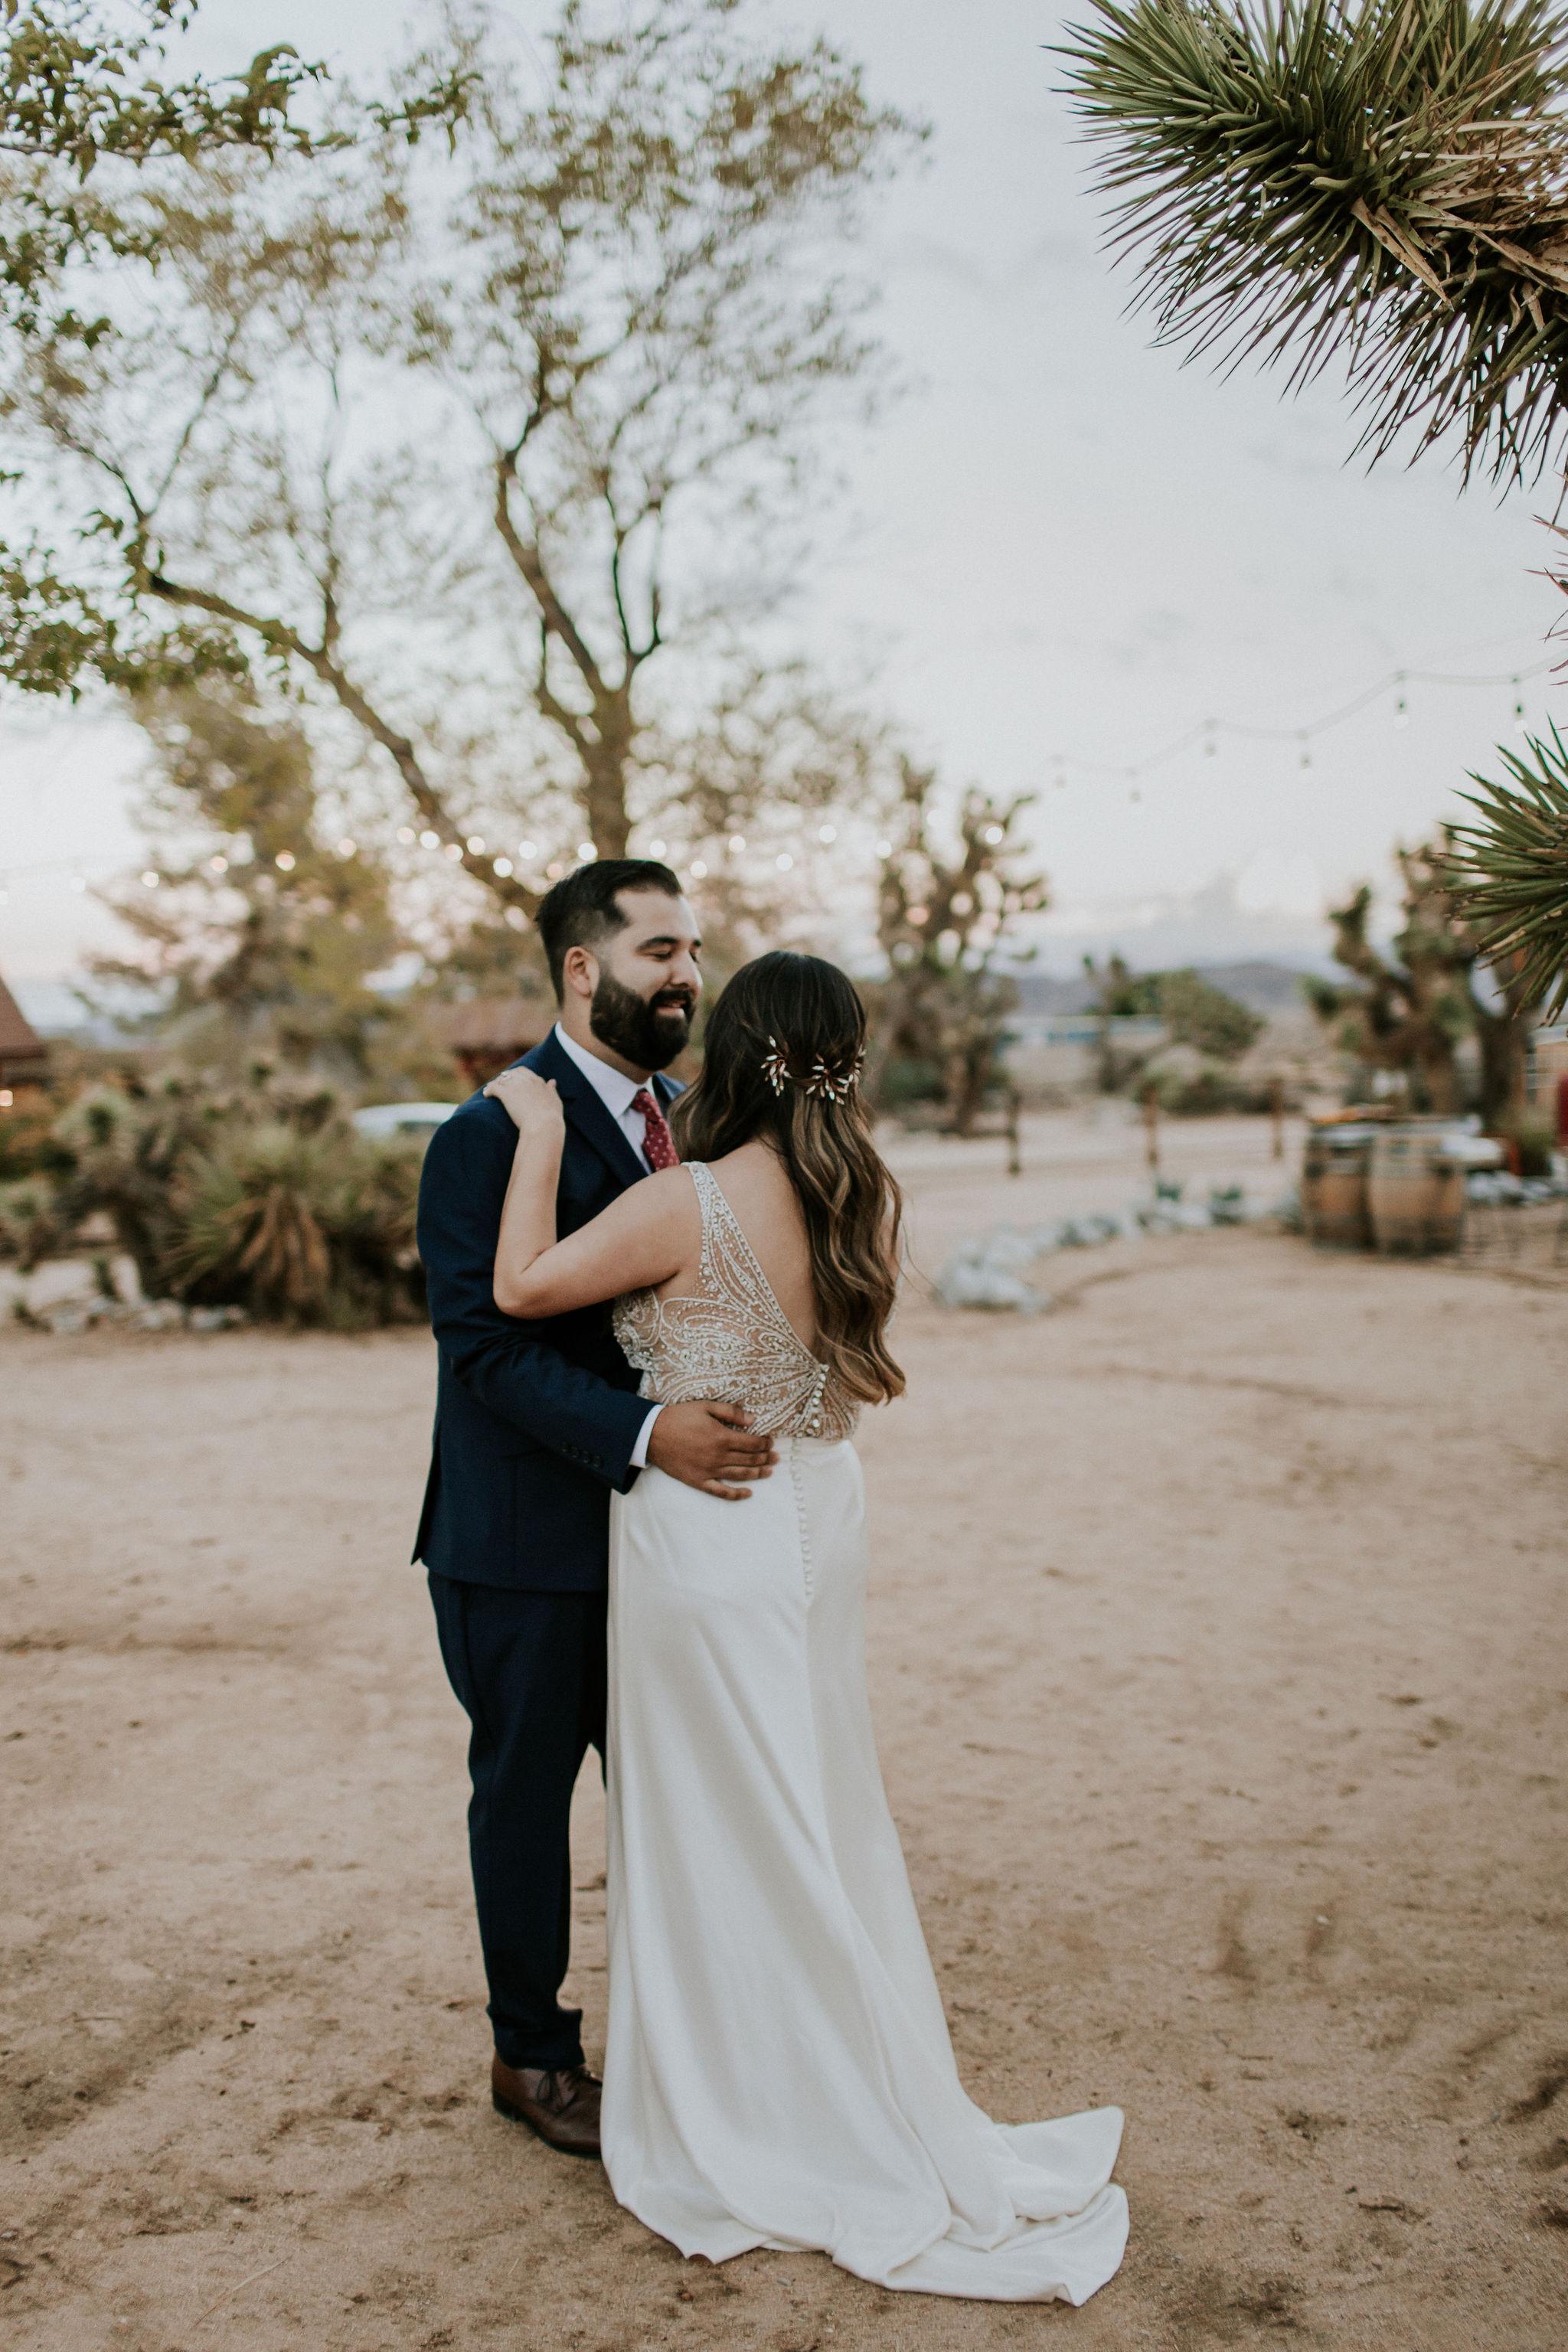 RimrockRanch-JoshuaTree-Wedding-Jami-Laree-815.jpg